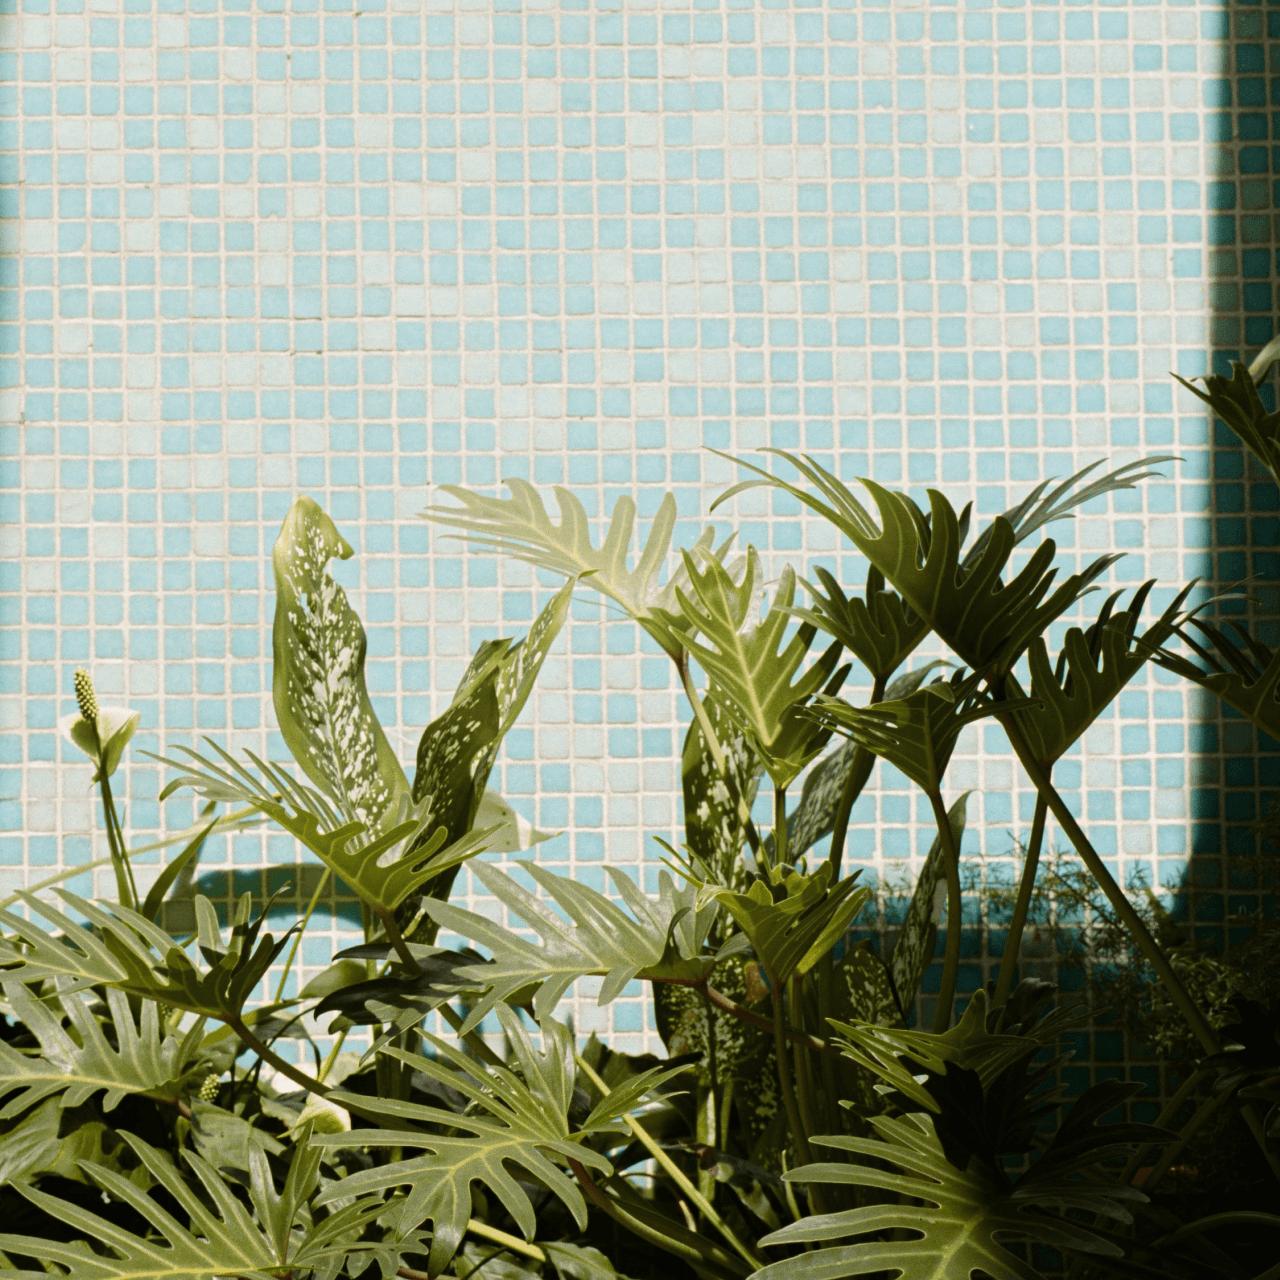 12 Surprisingly Effective Ways to Make Your Bathroom More Eco-Friendly